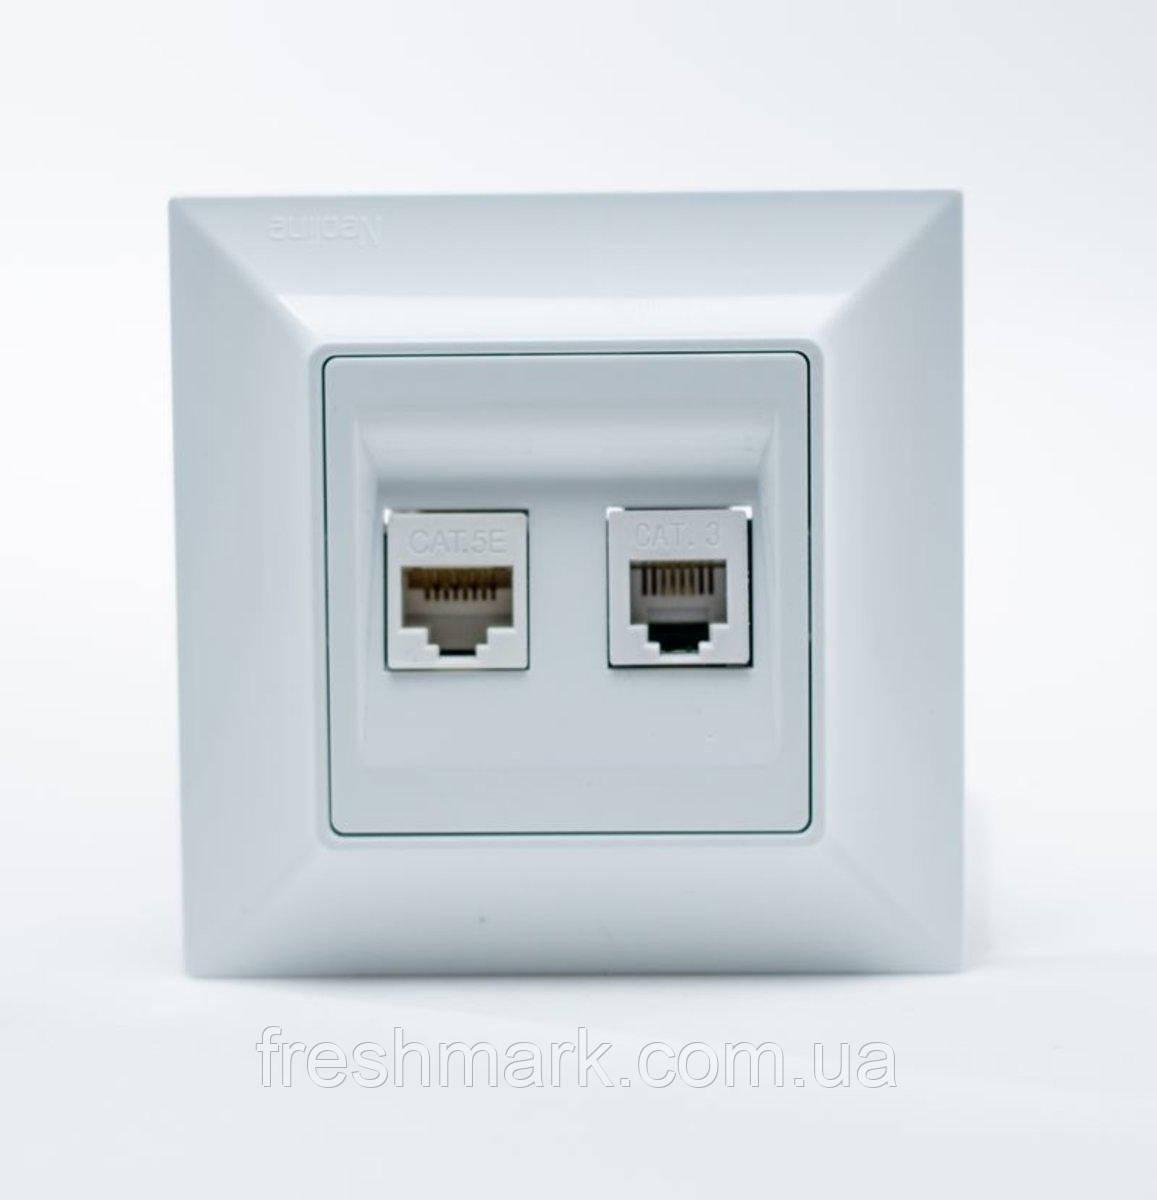 Розетка компьютерная-телефонная GUNSAN Neoline cat.5E Белая